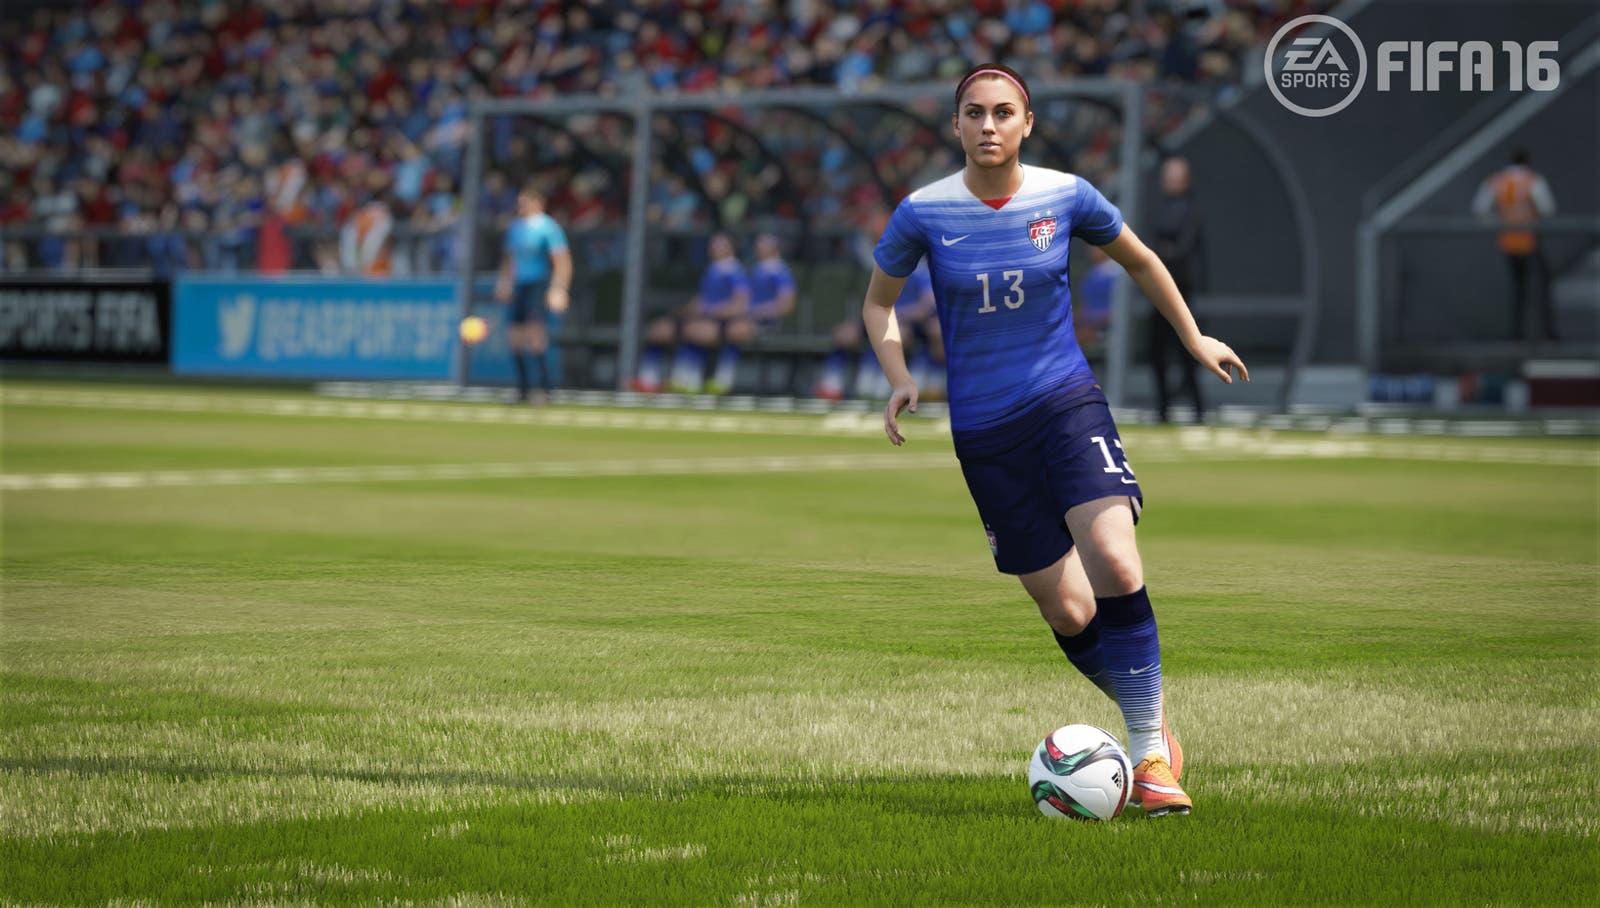 FIFA16_XboxOne_PS4_Women_MorganHero_LR.j